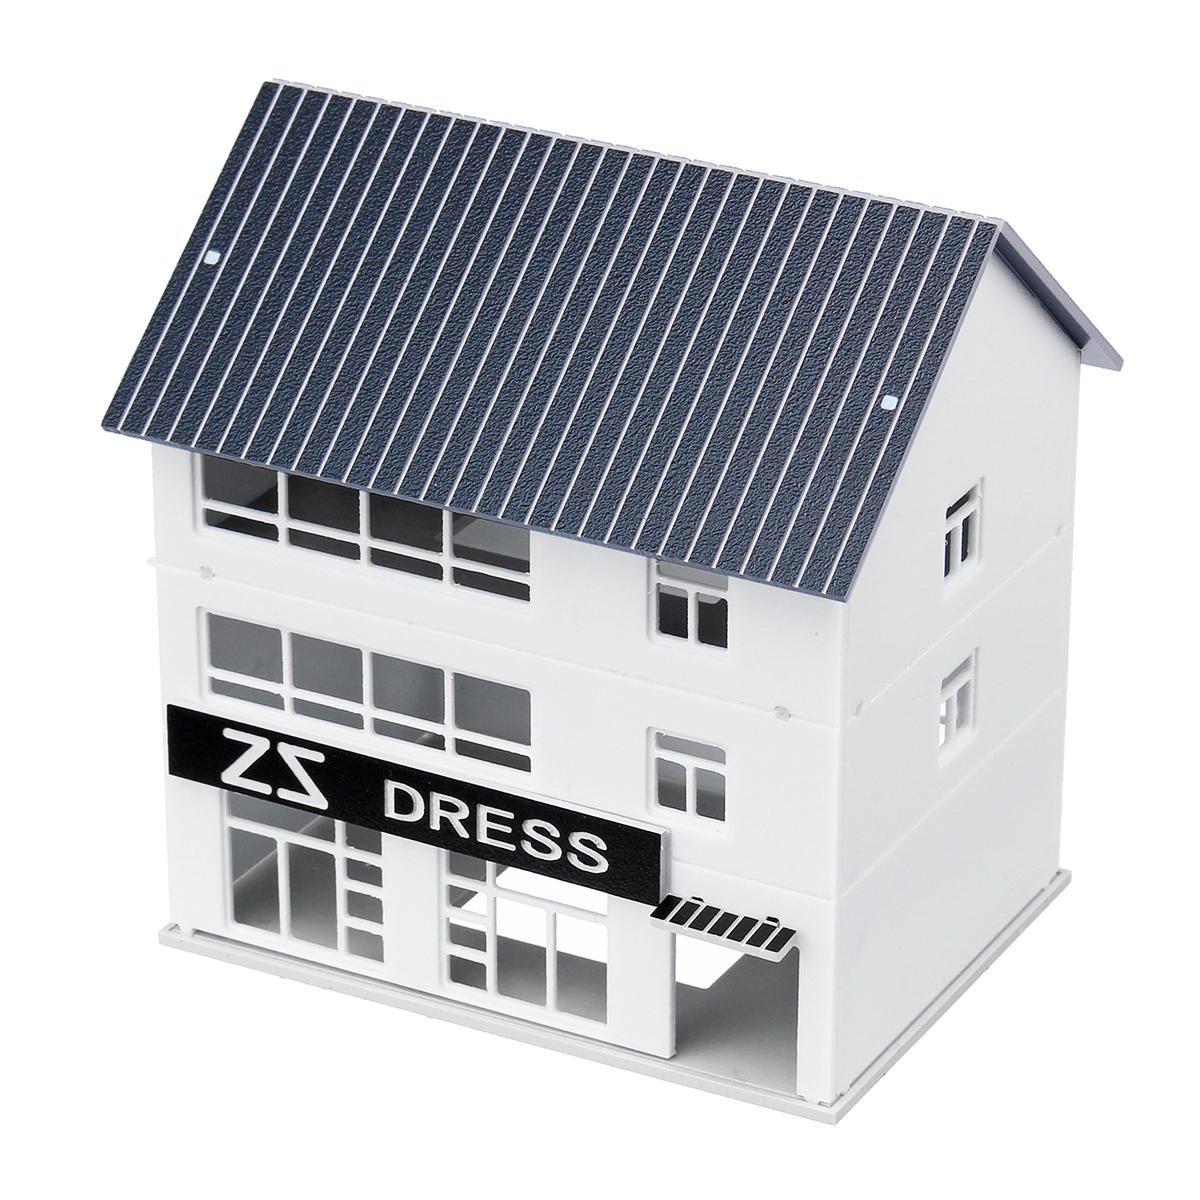 1/150 Outland Building Model N Scale Gauge Scene Story Dress Store Modern House